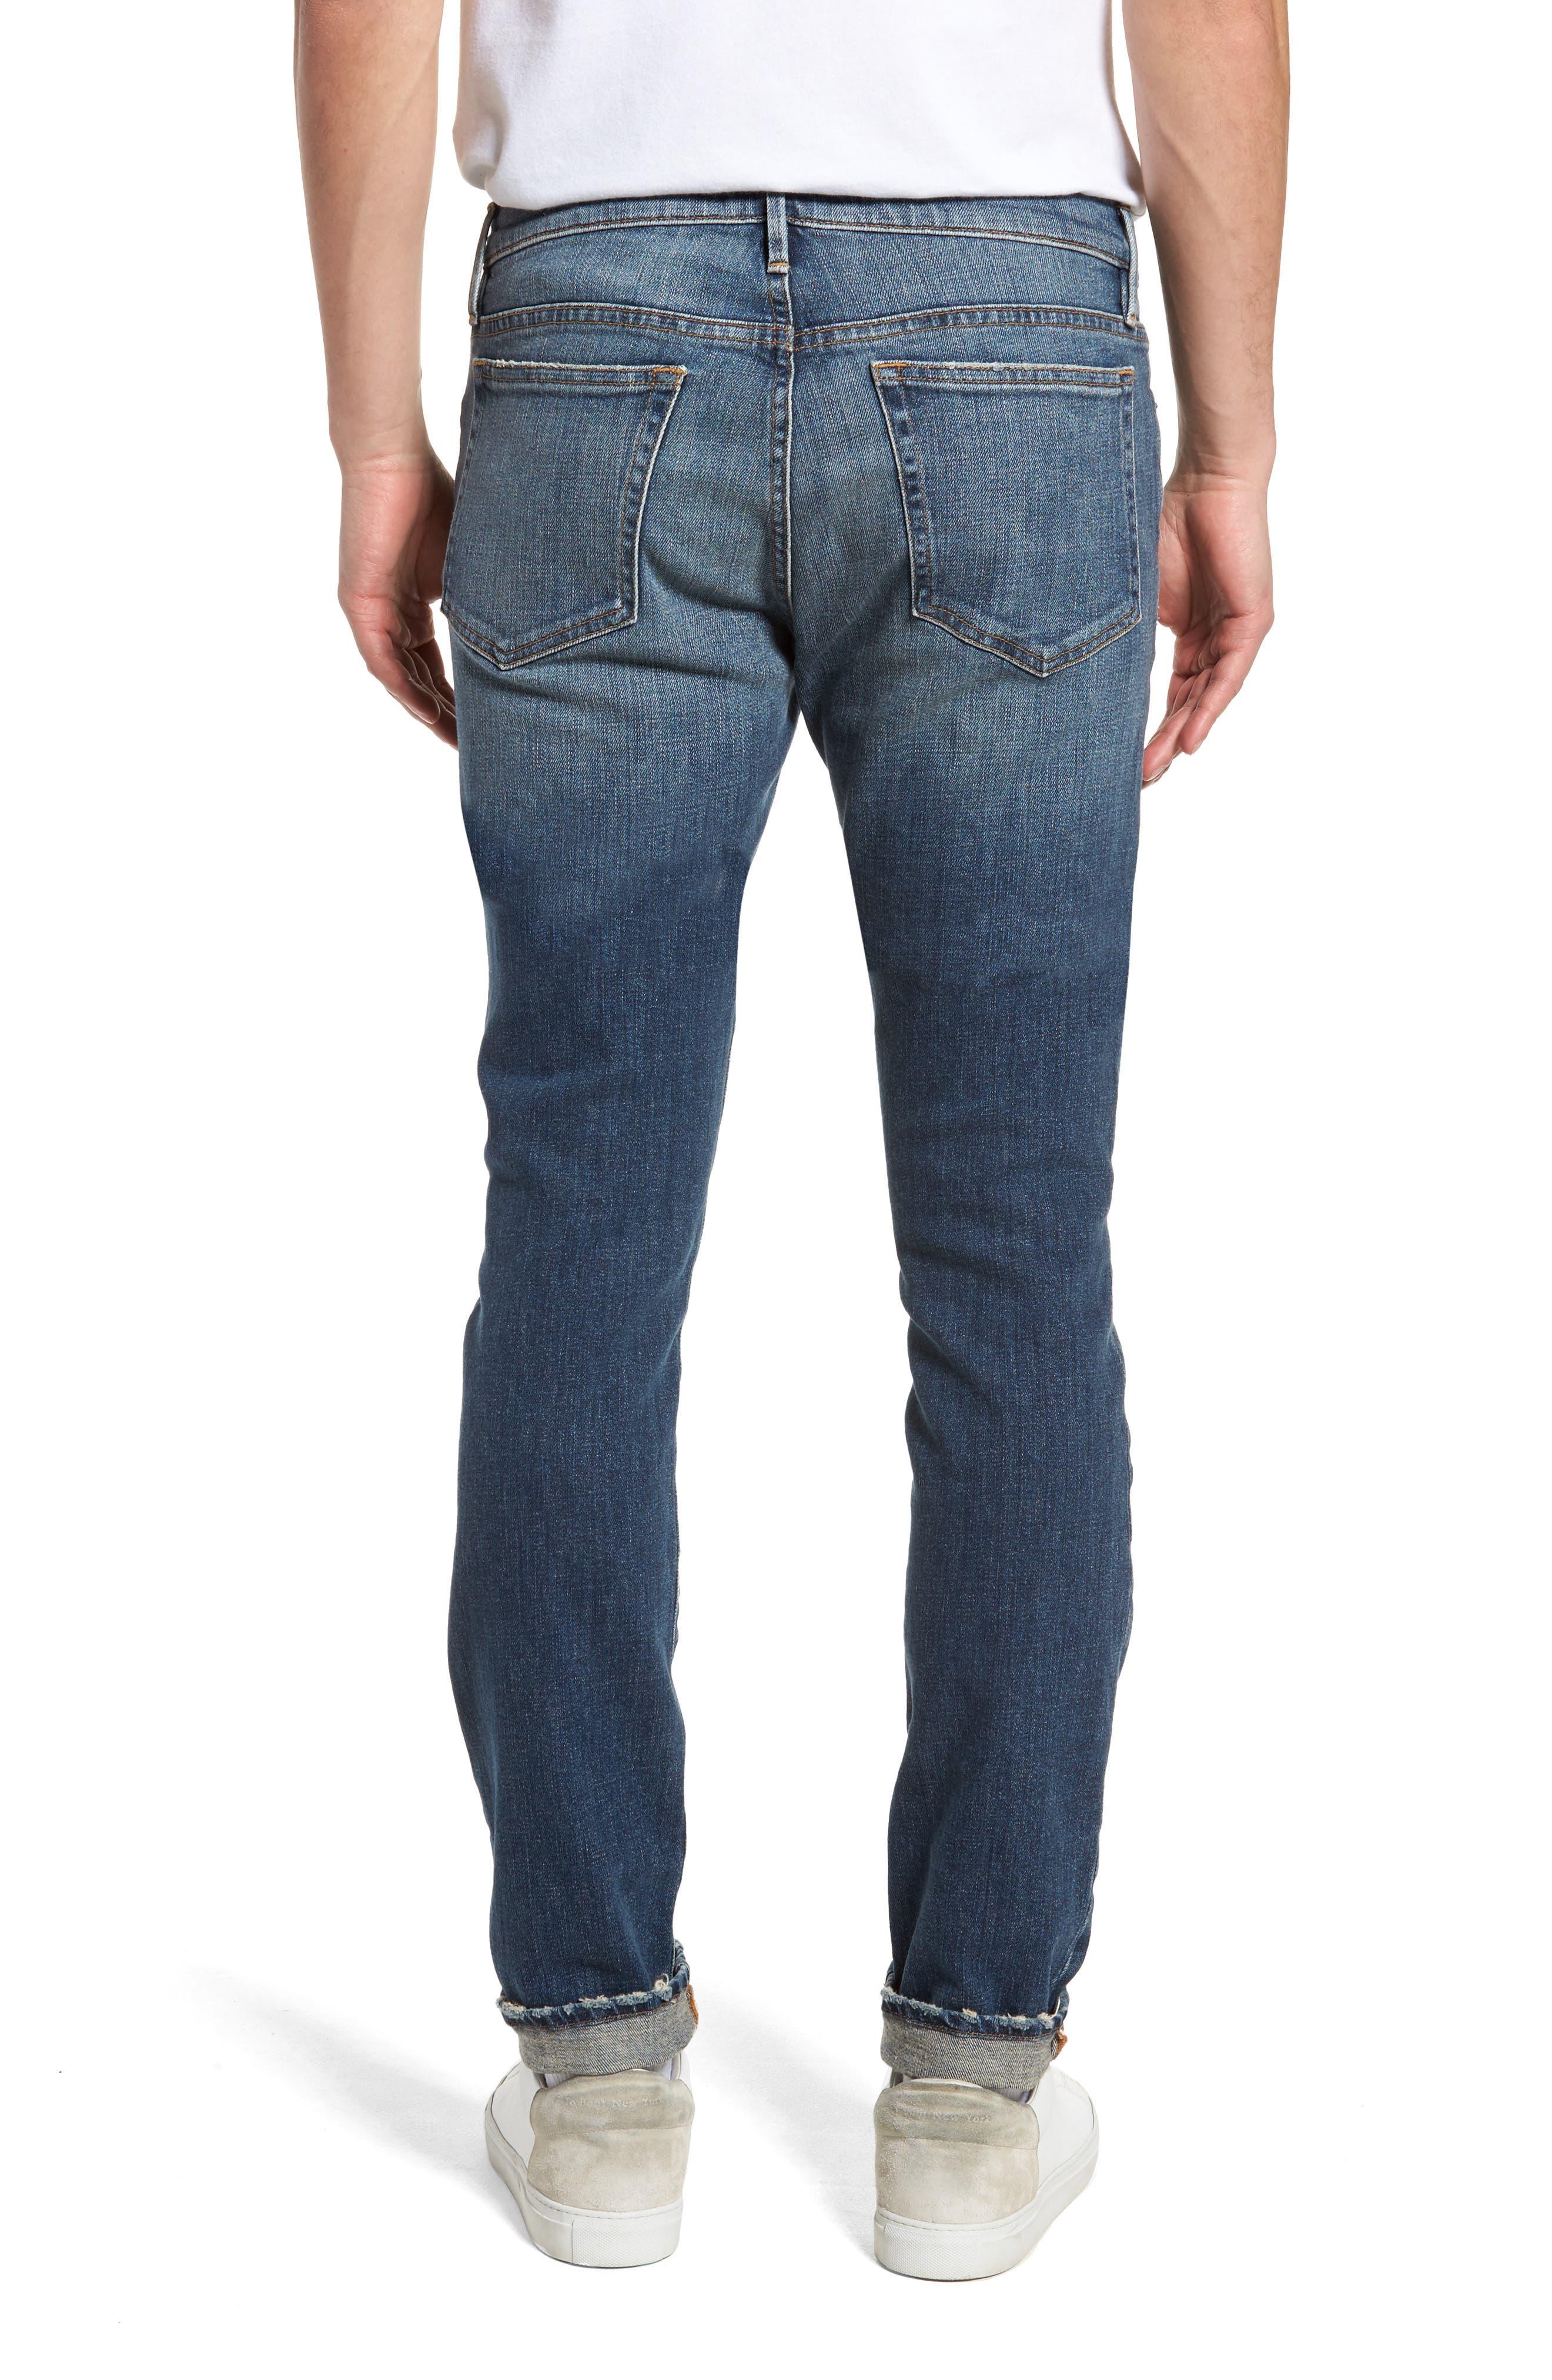 L'Homme Skinny Fit Jeans,                             Alternate thumbnail 2, color,                             405